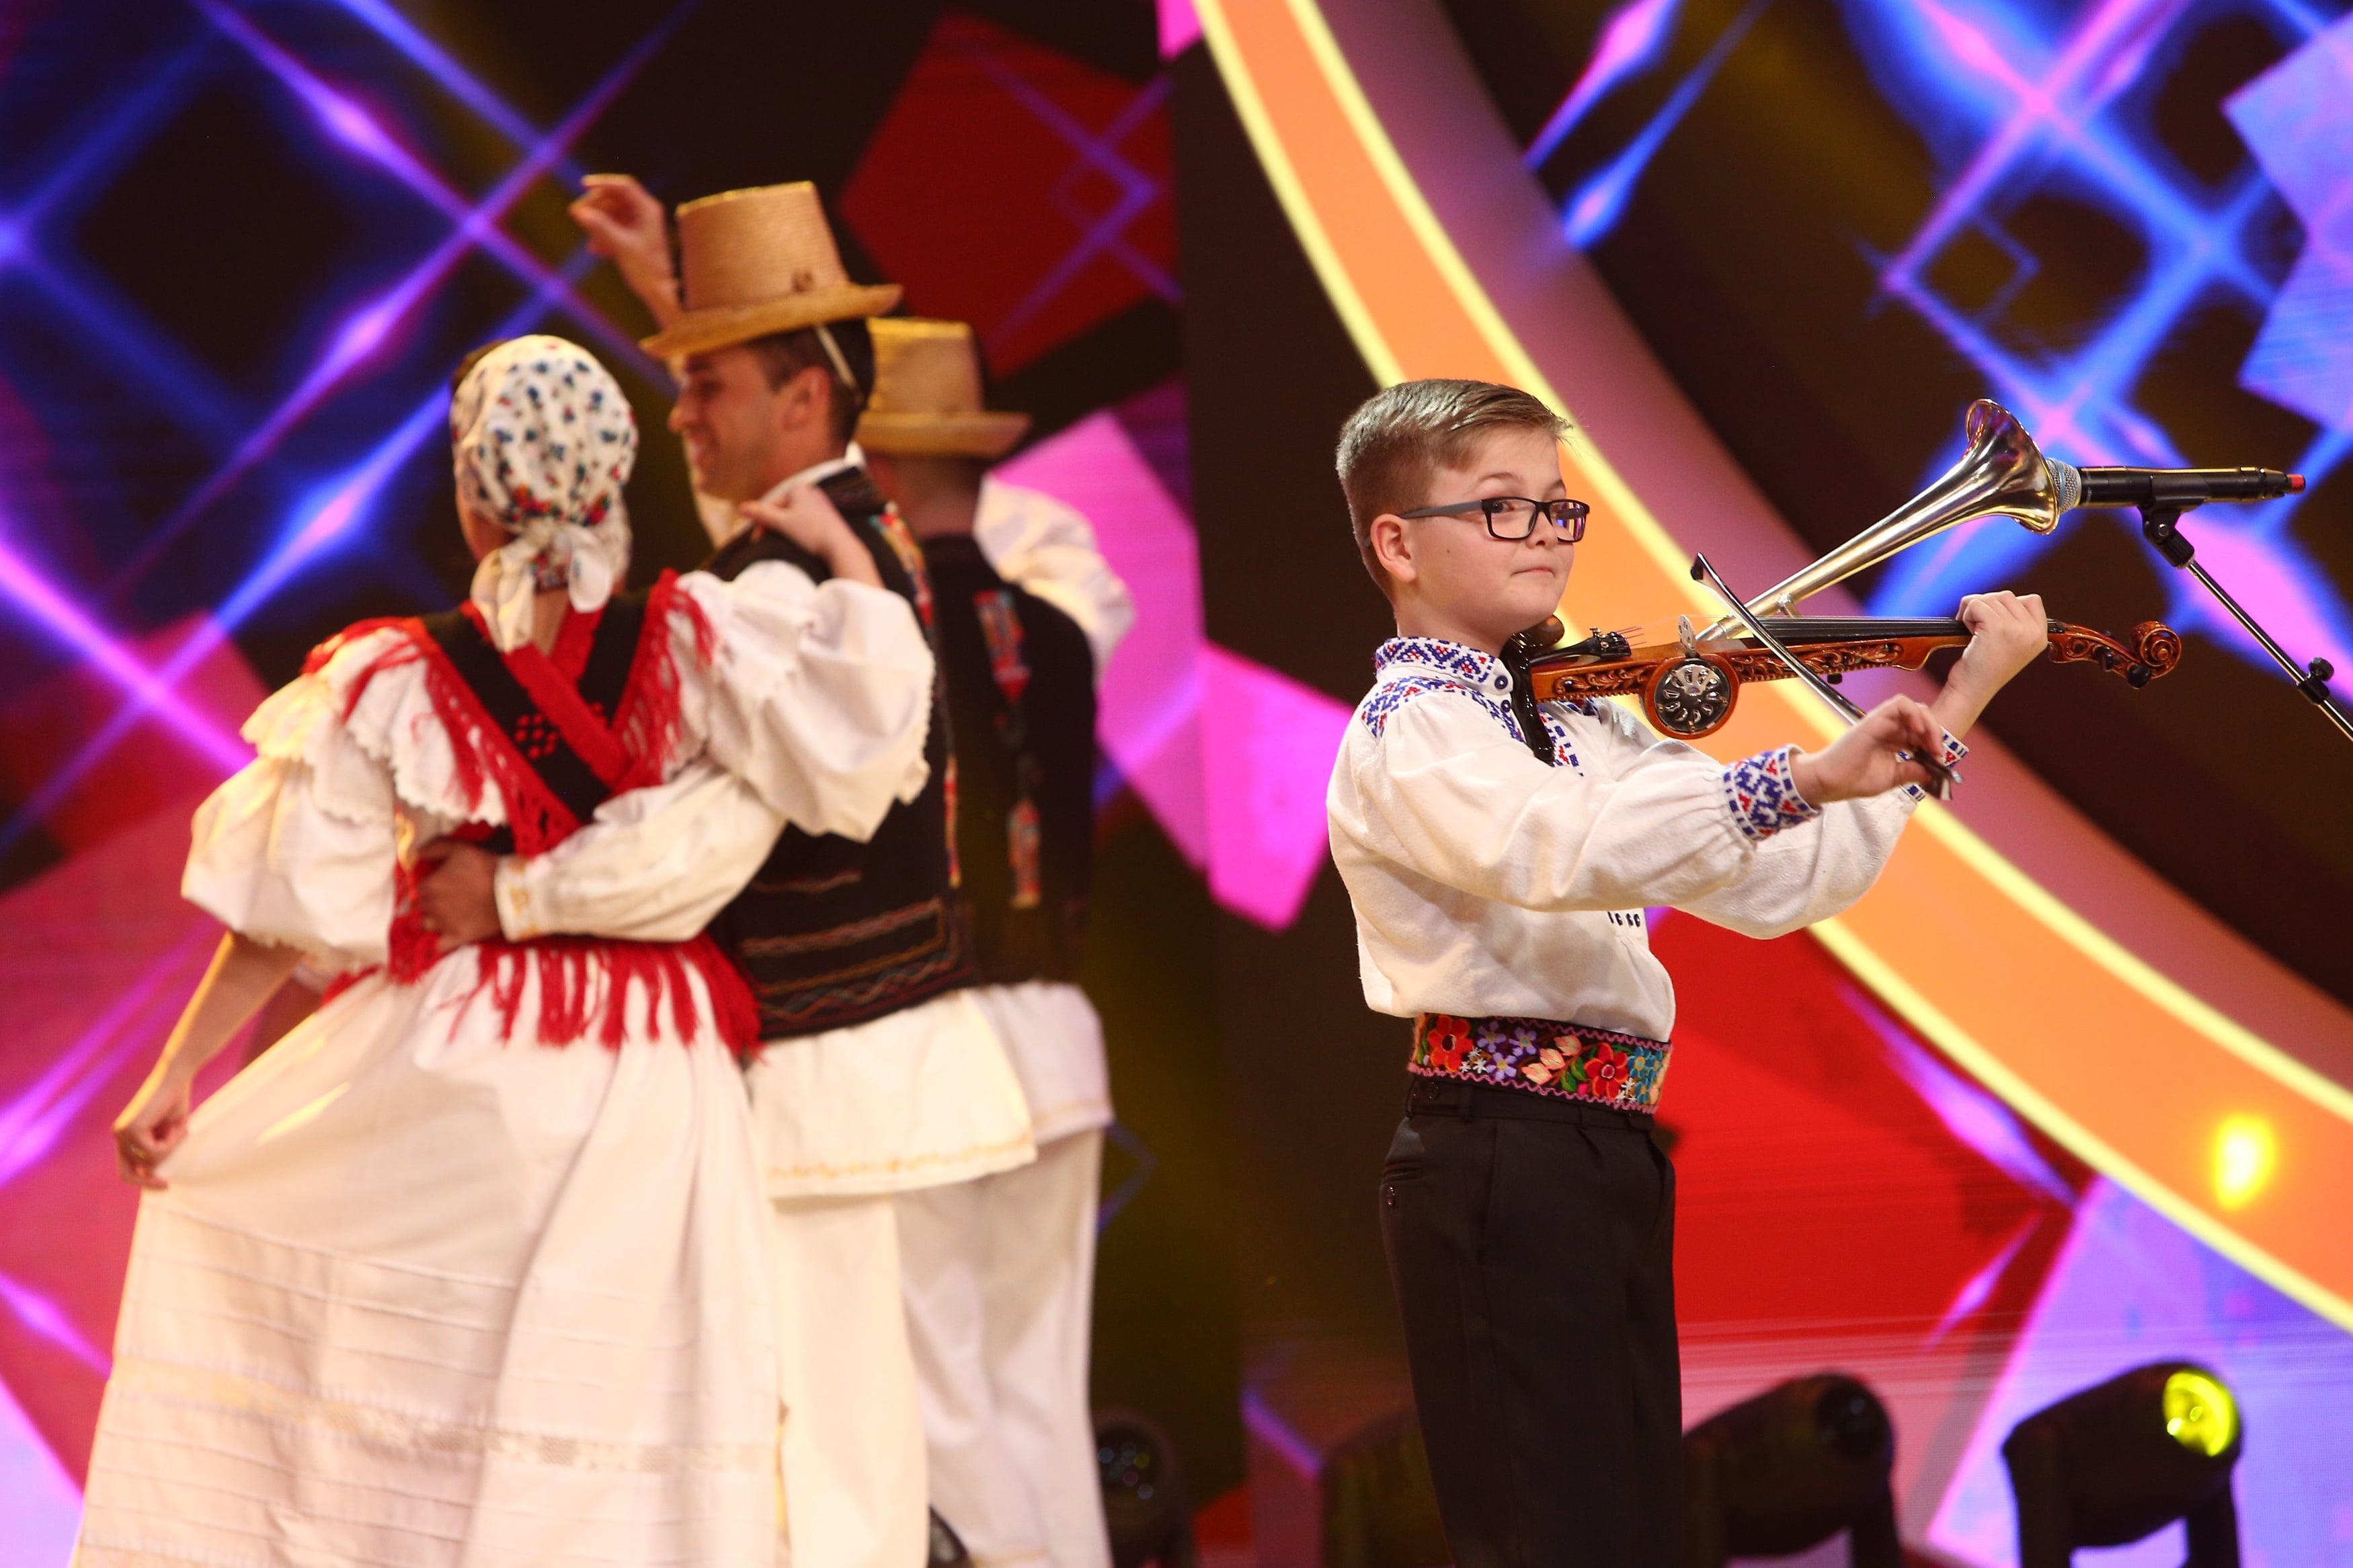 Finala Next Star 2021. Alex Lucaciu, moment inedit cu un instrument cu nume special. Un jurat i-a dat vot negativ